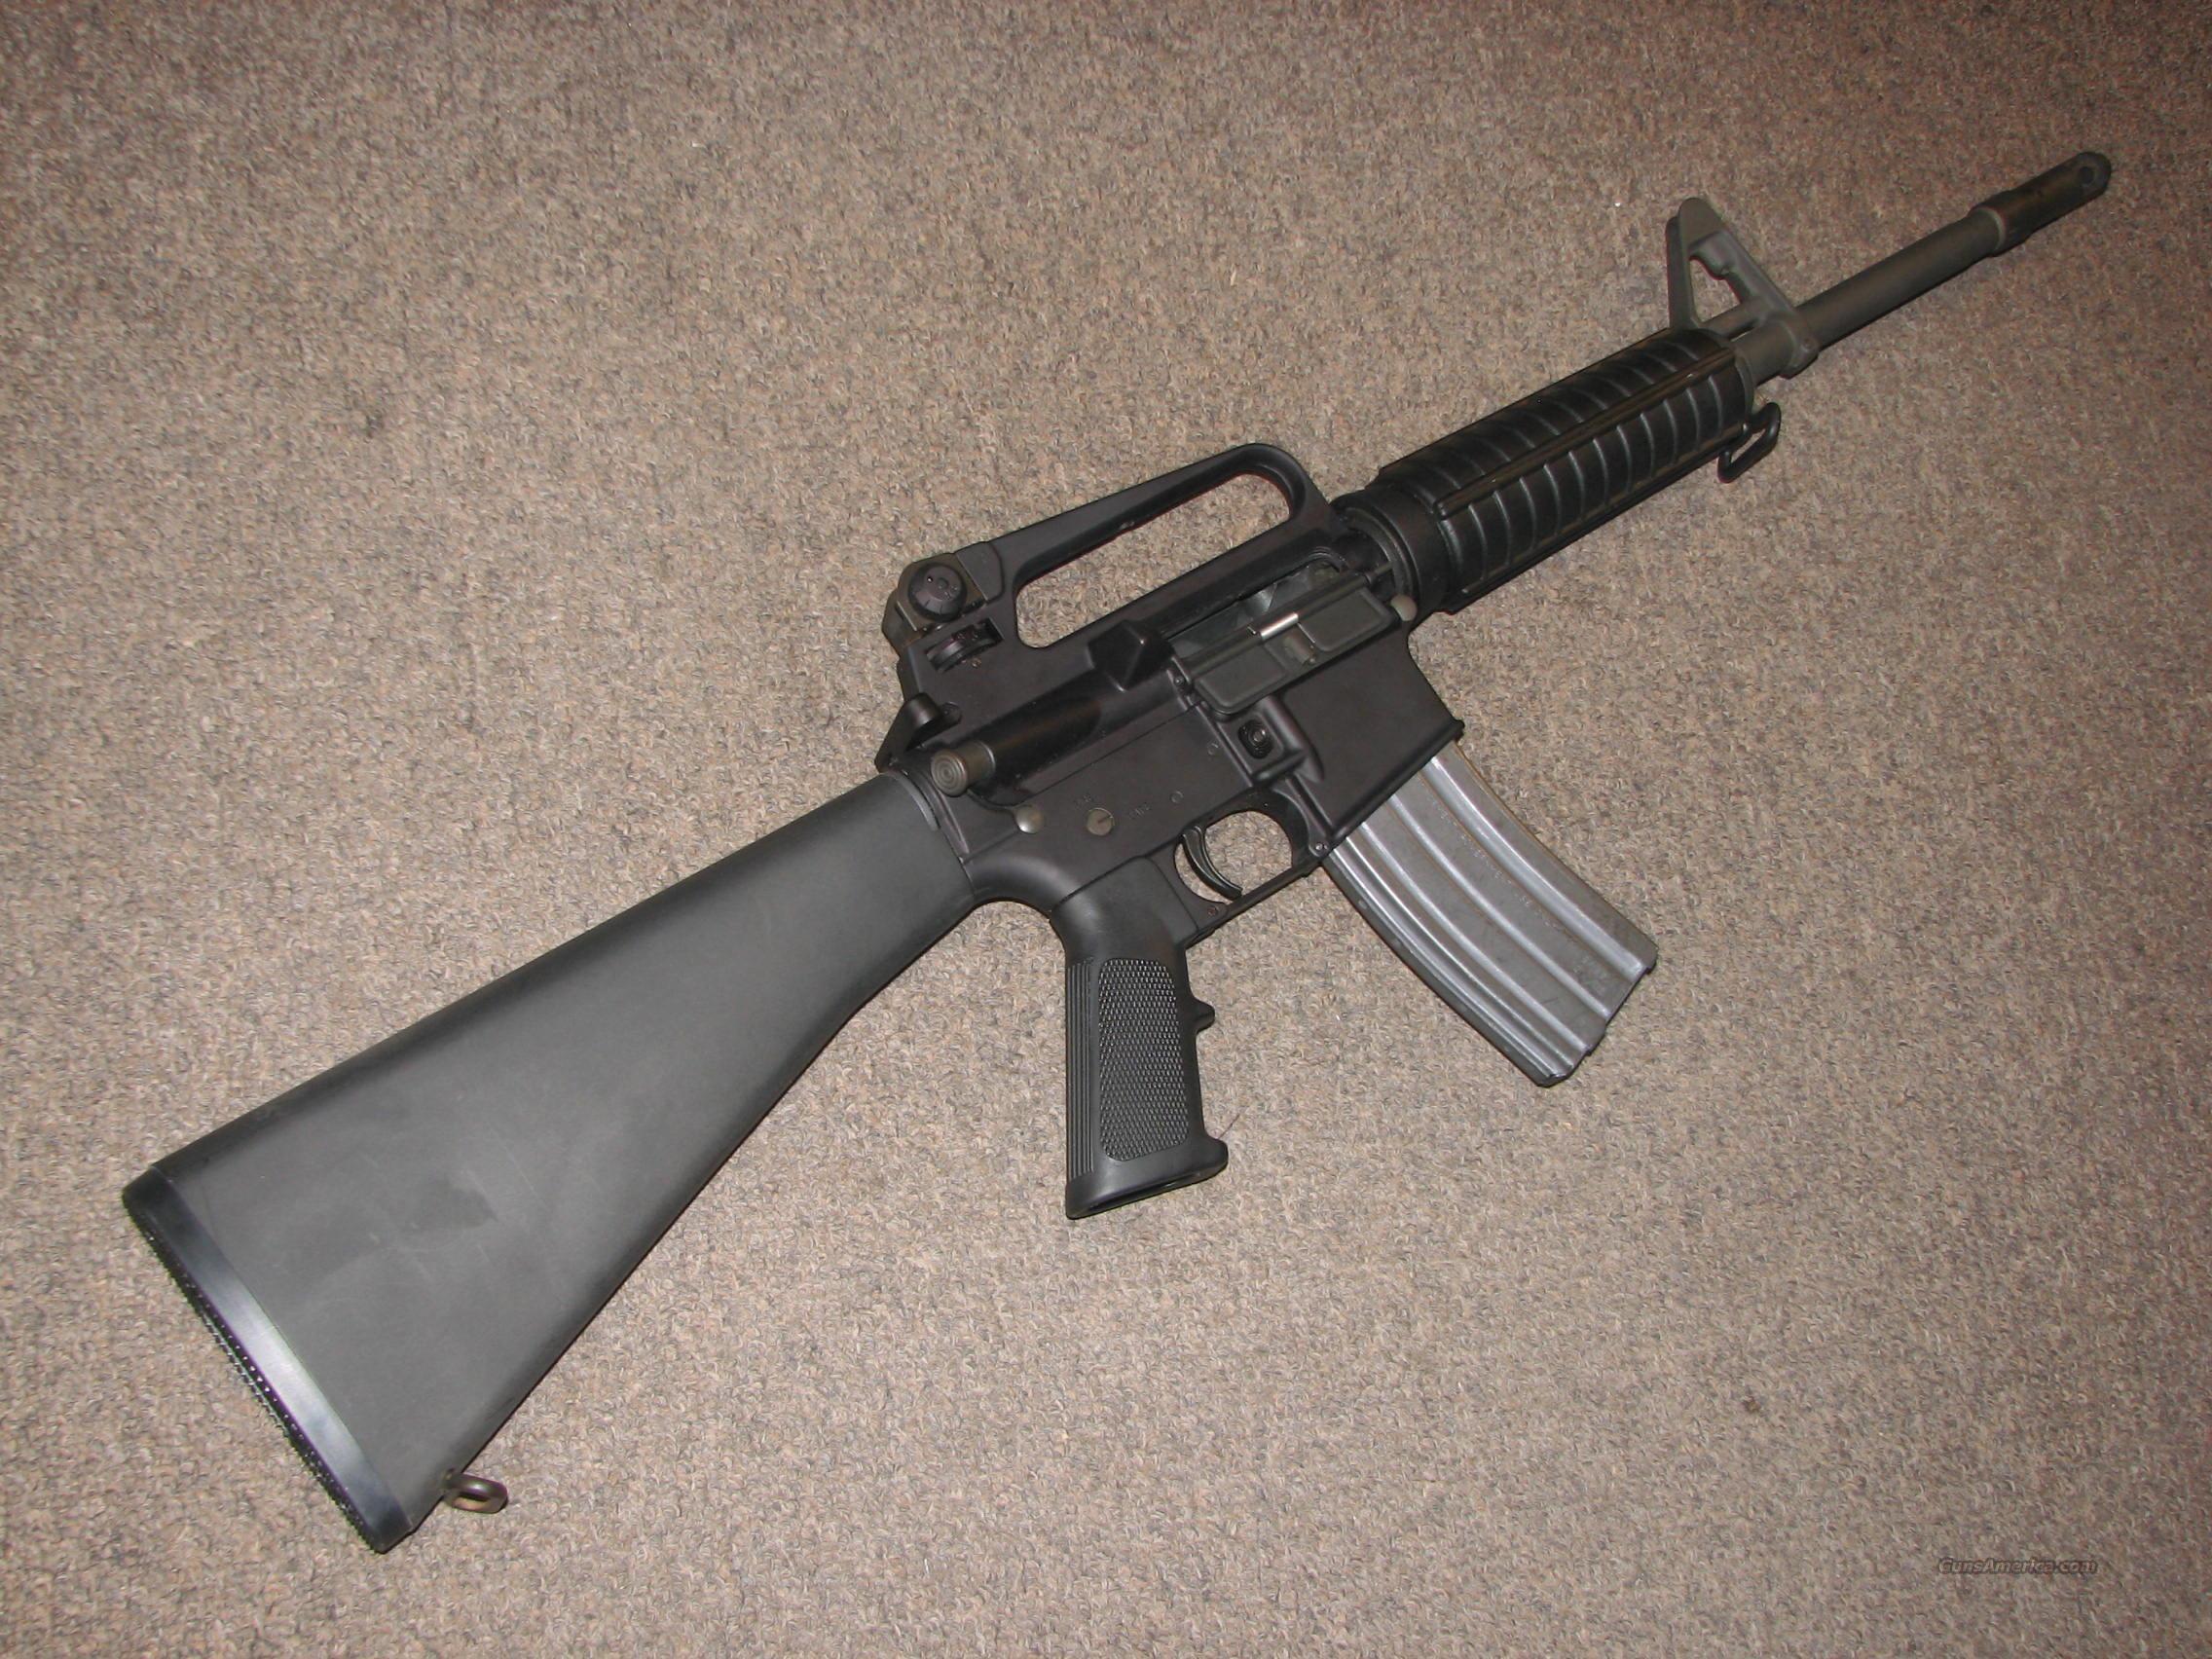 BUSHMASTER XM15-E2S AR=15 .223 REM (5.56 NATO) For Sale